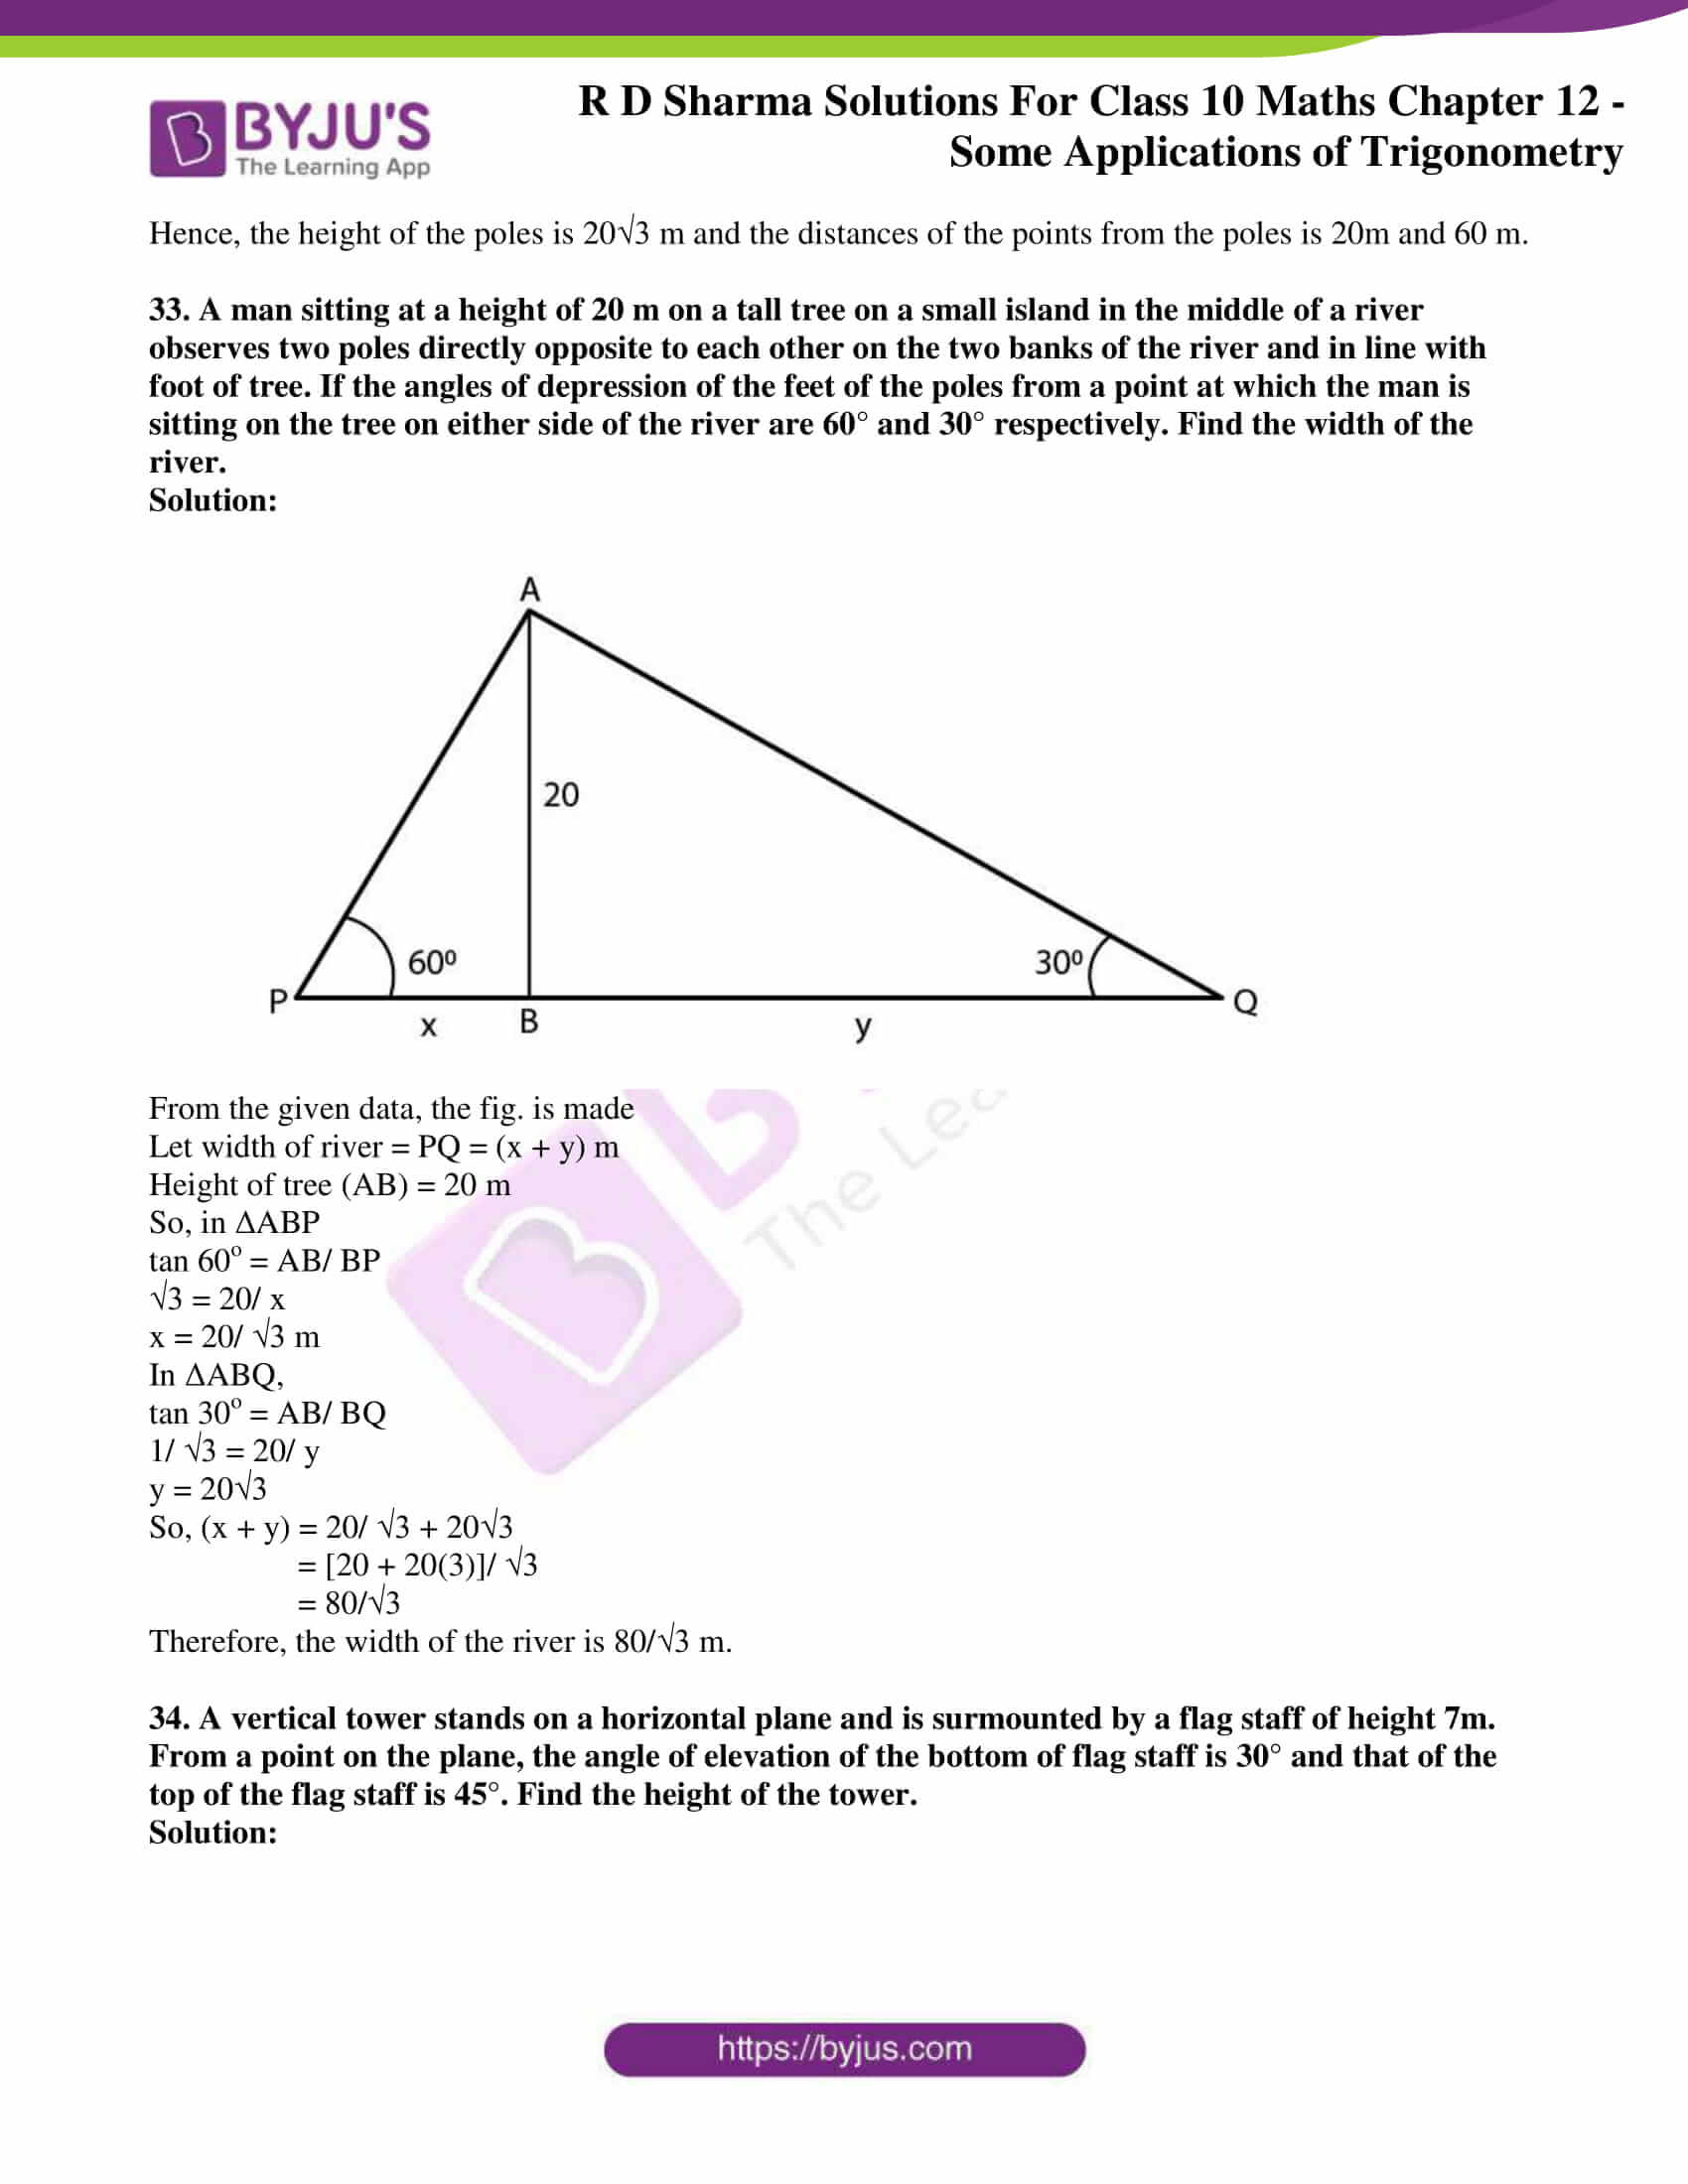 rd sharma class 10 chapter 12 applications trigonometry solutions 32